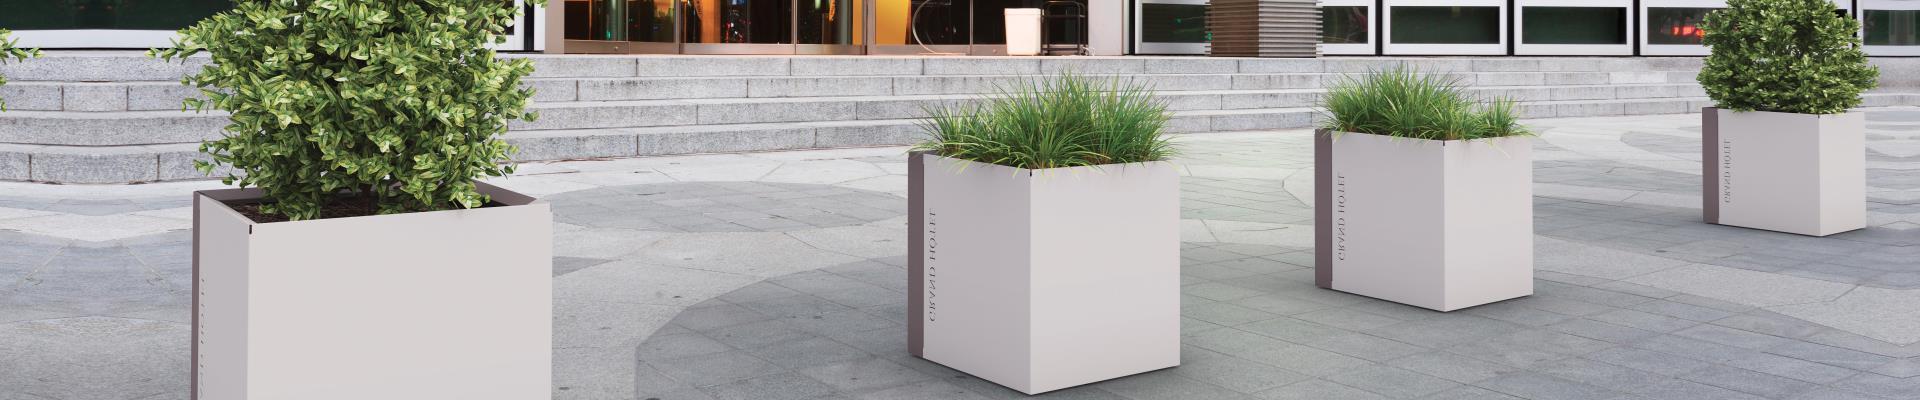 Jardinera metálica exterior para mobiliario urbano.